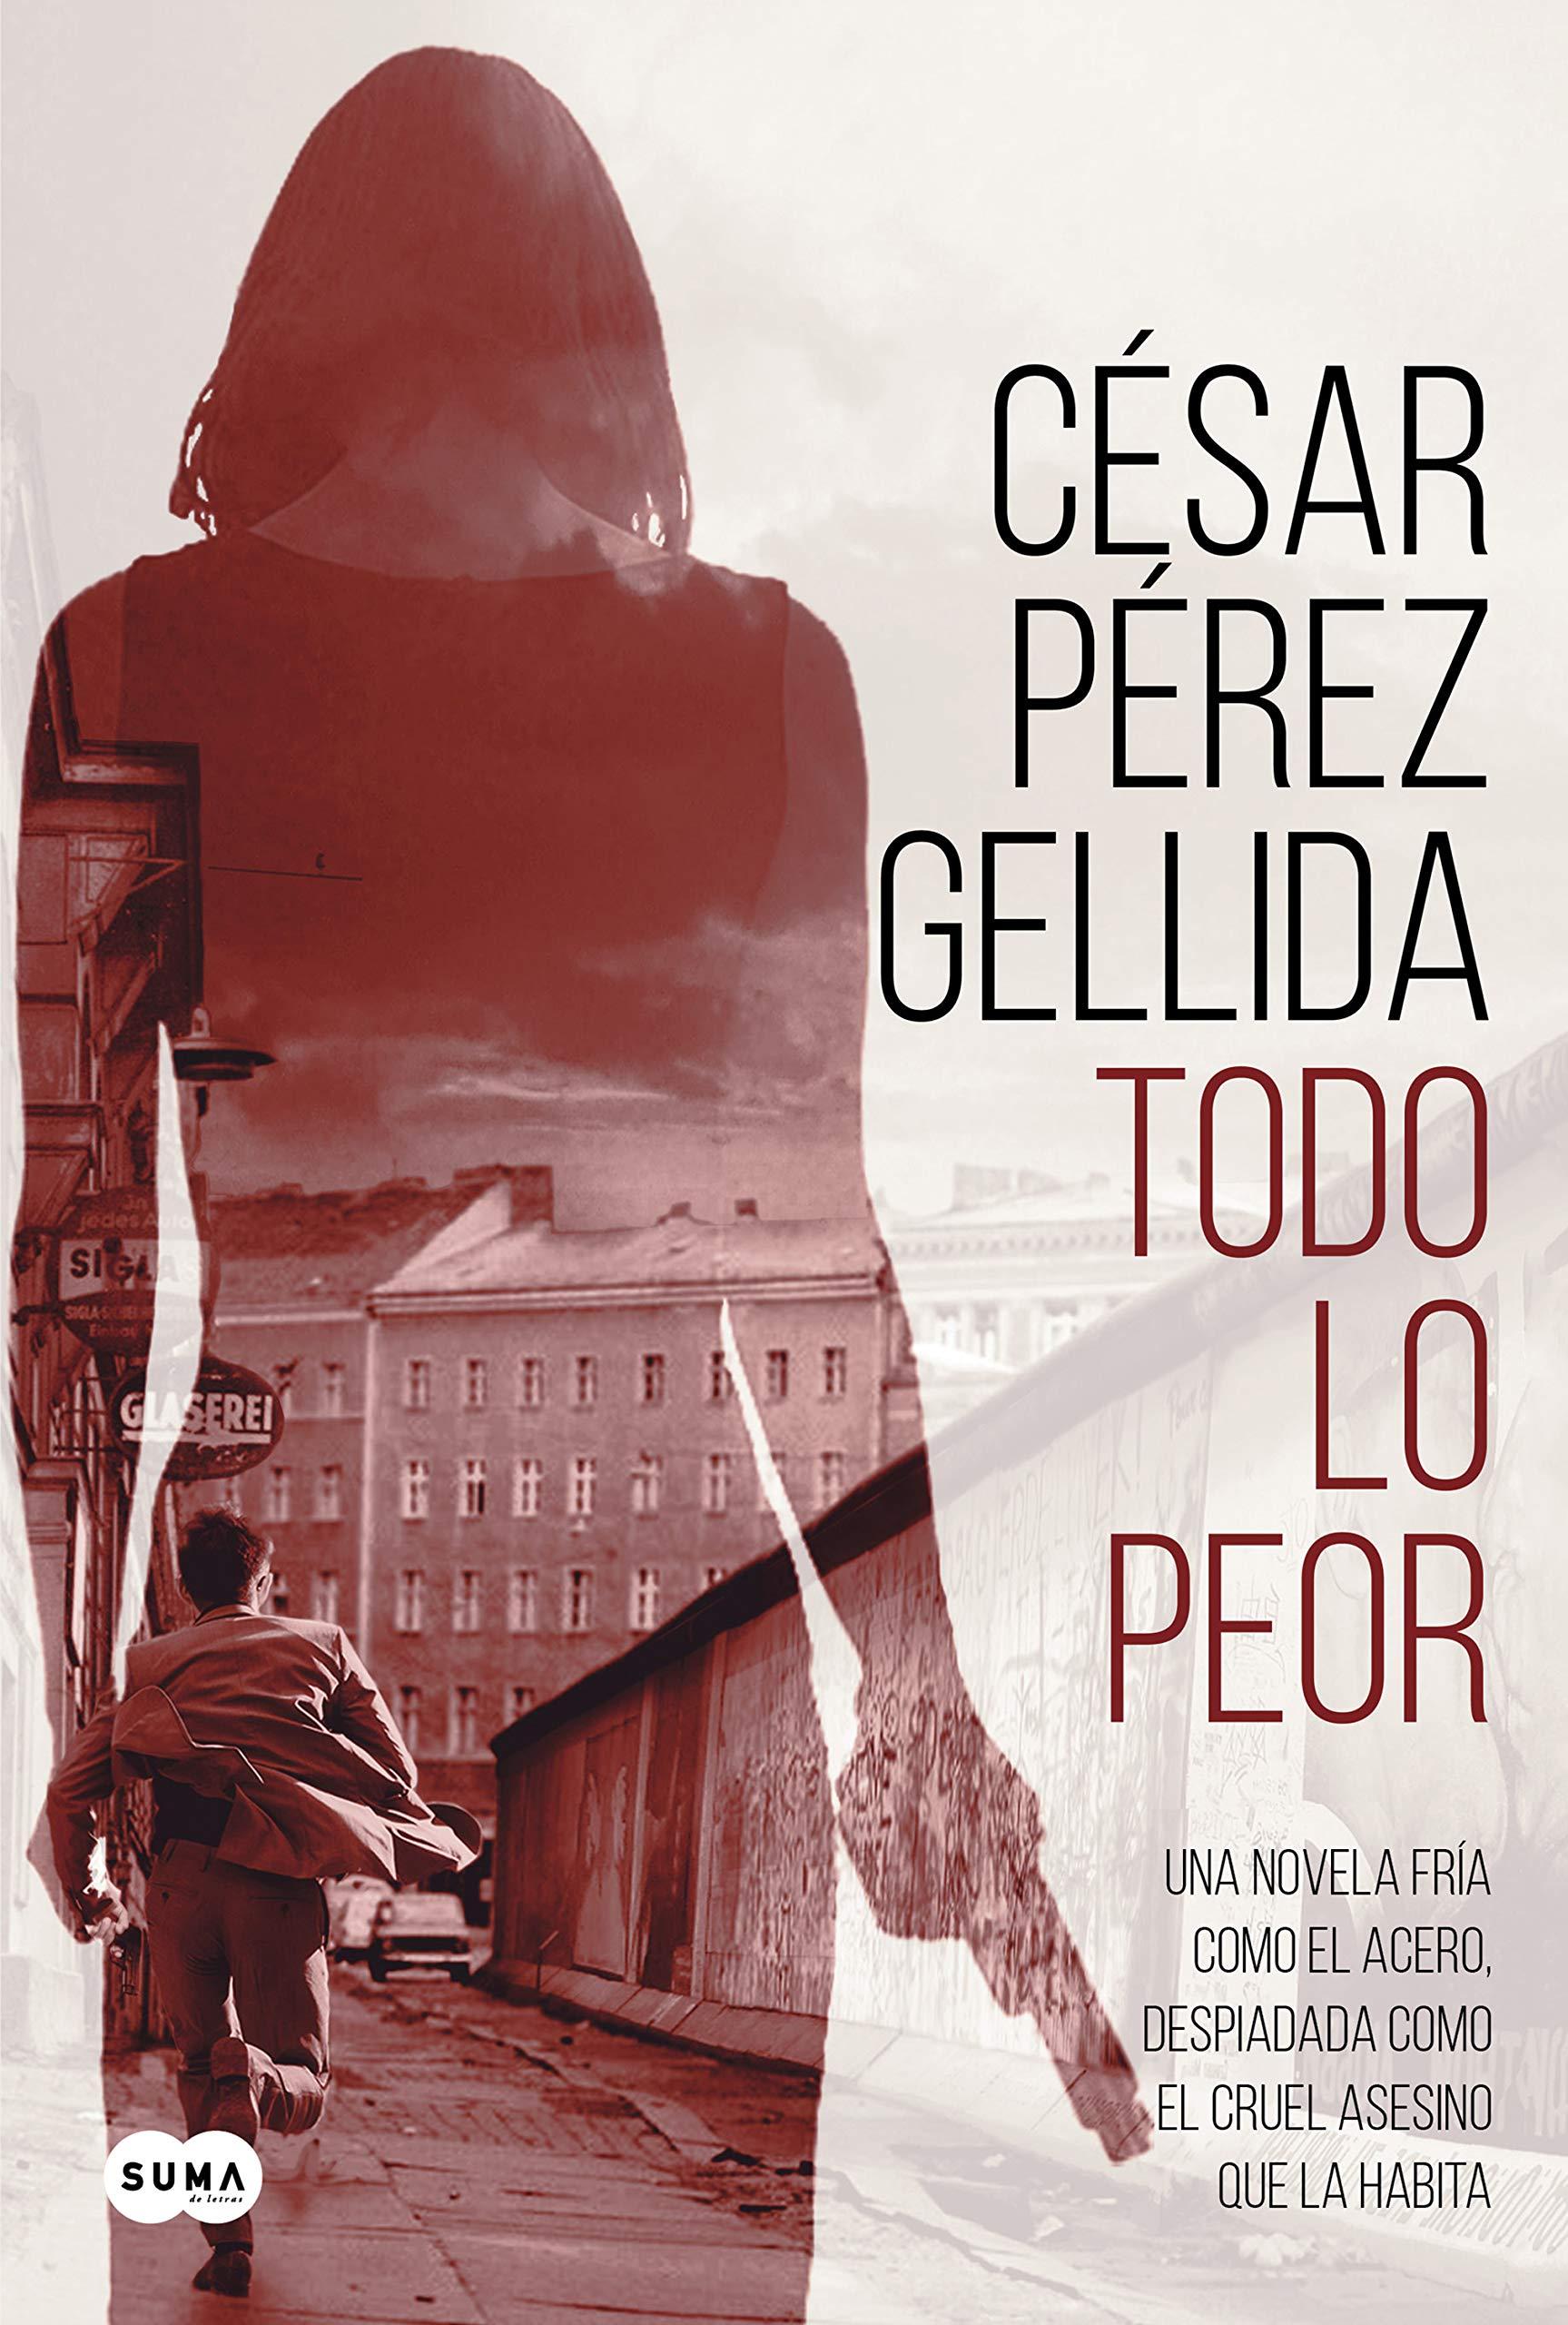 Todo lo peor (Tinta negra): Amazon.es: César Pérez Gellida ...